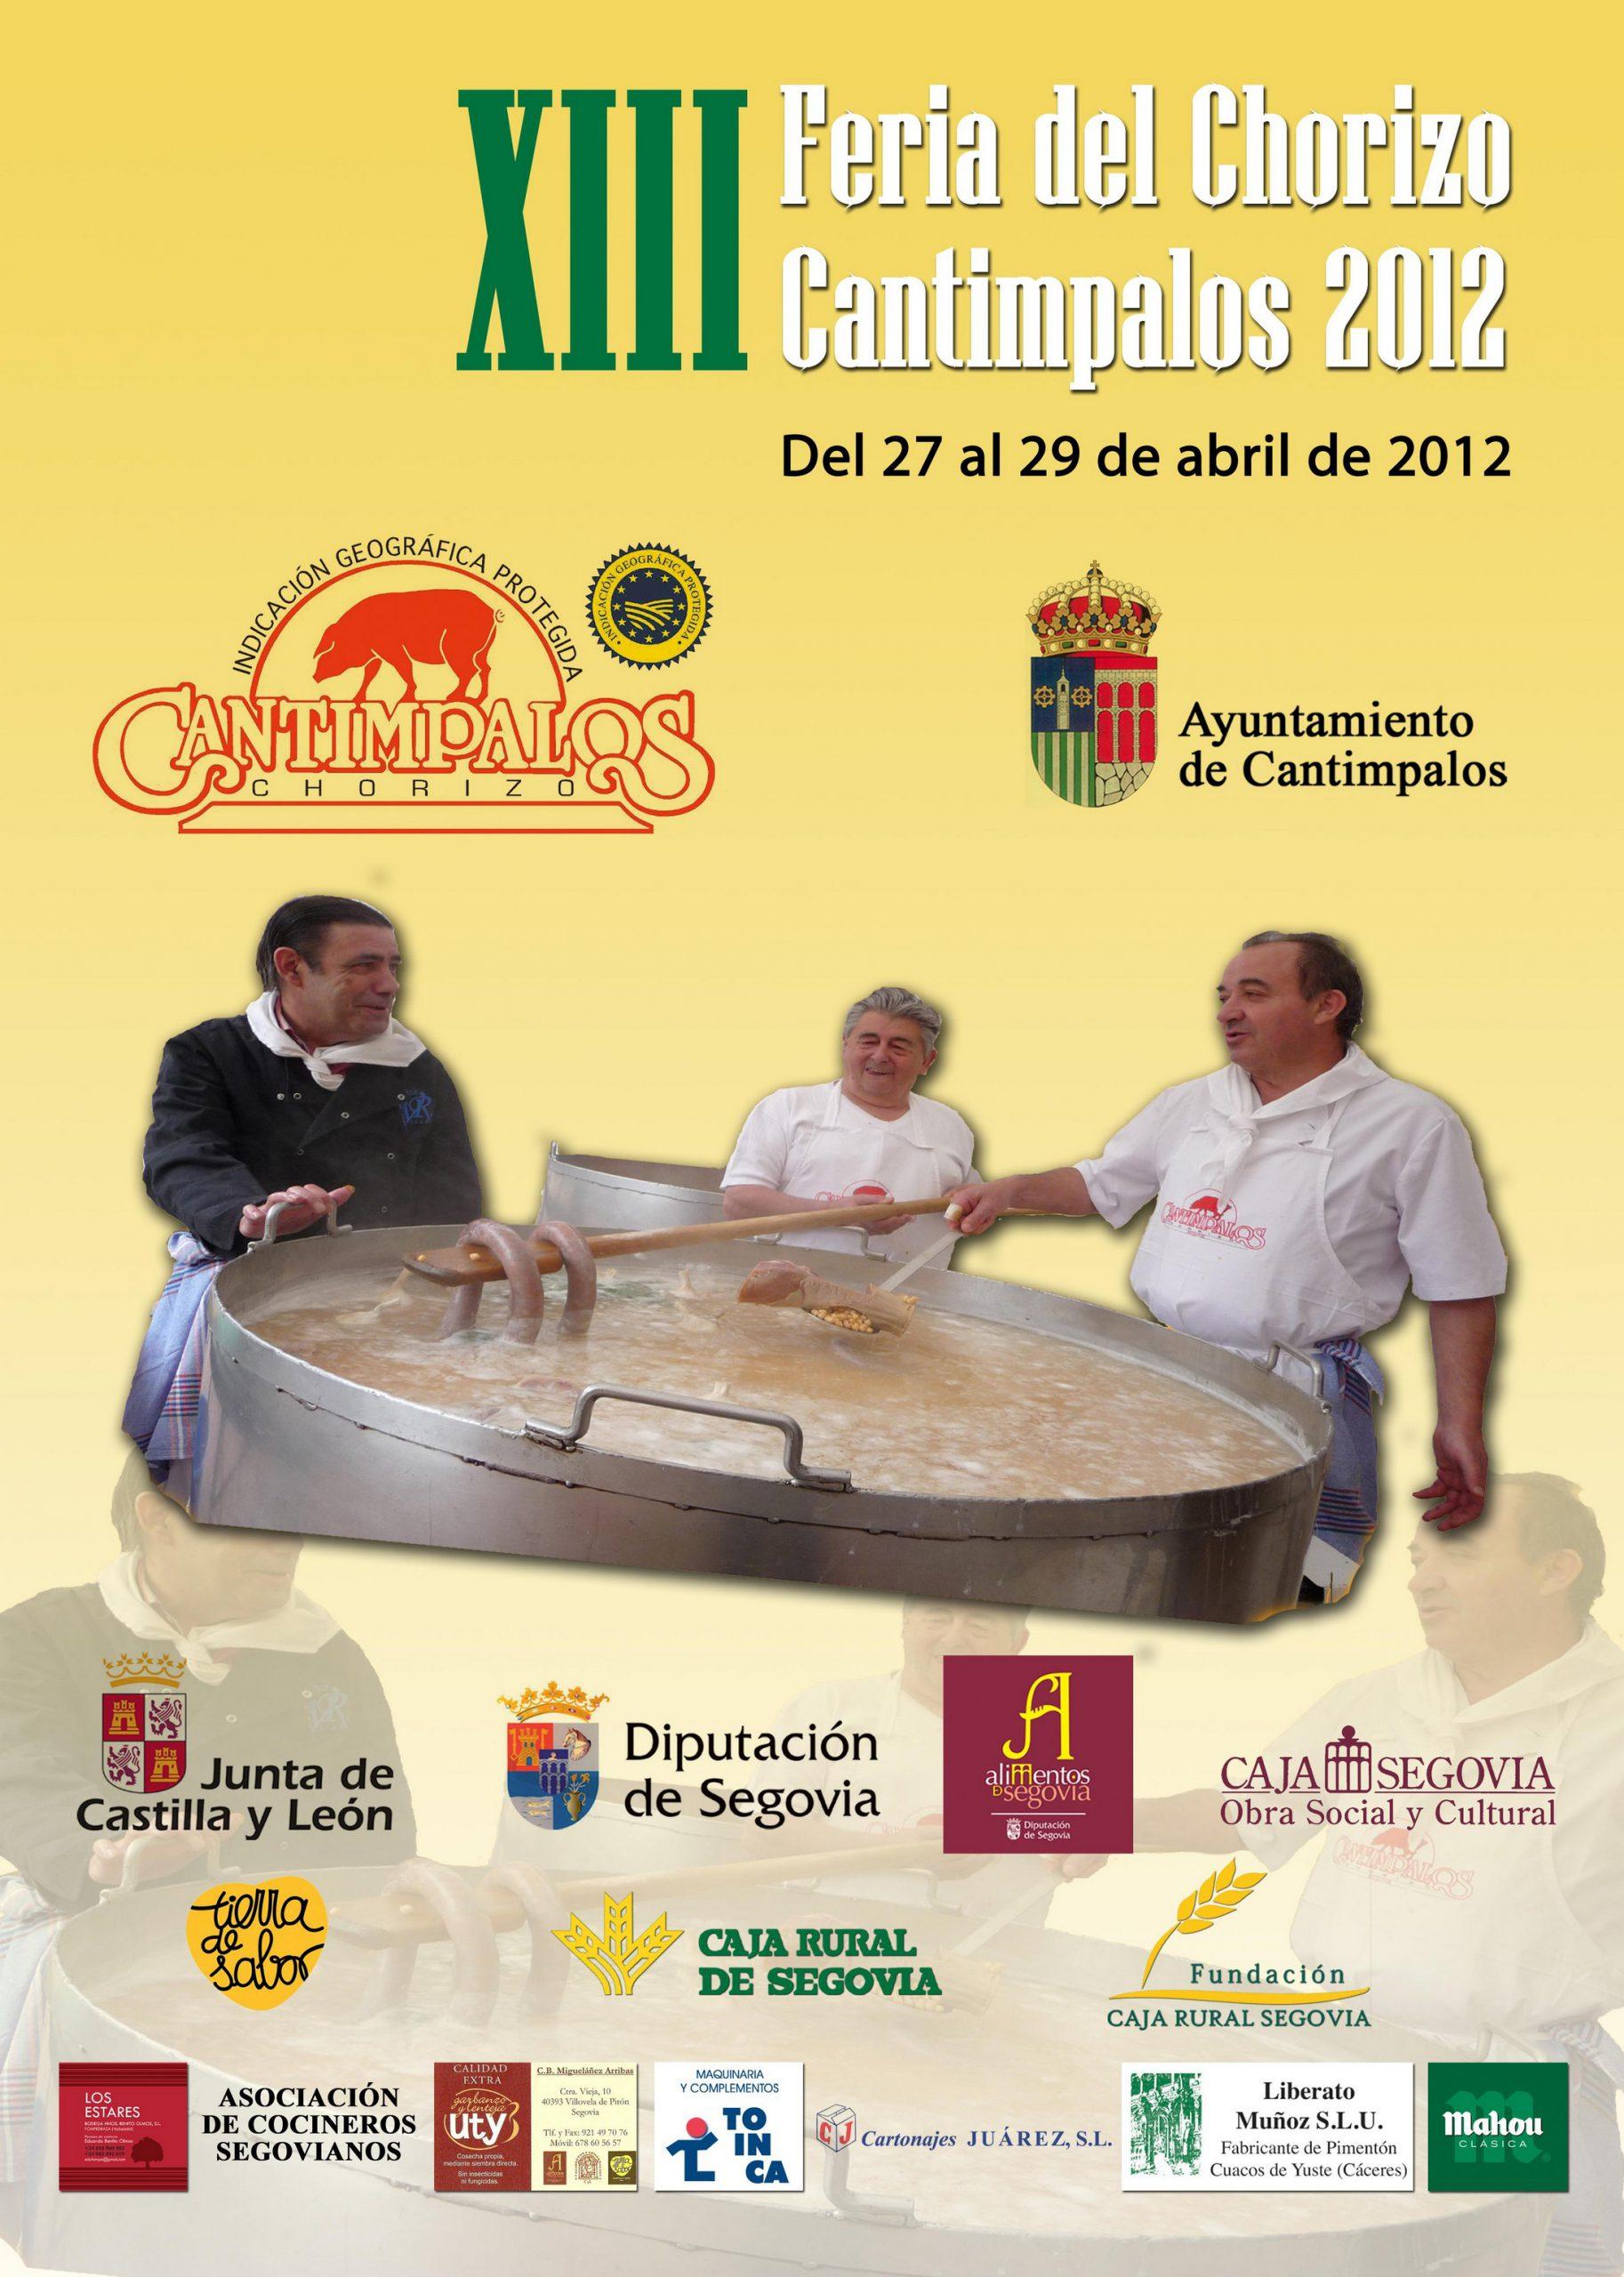 XIII Feria del Chorizo de Cantimpalos